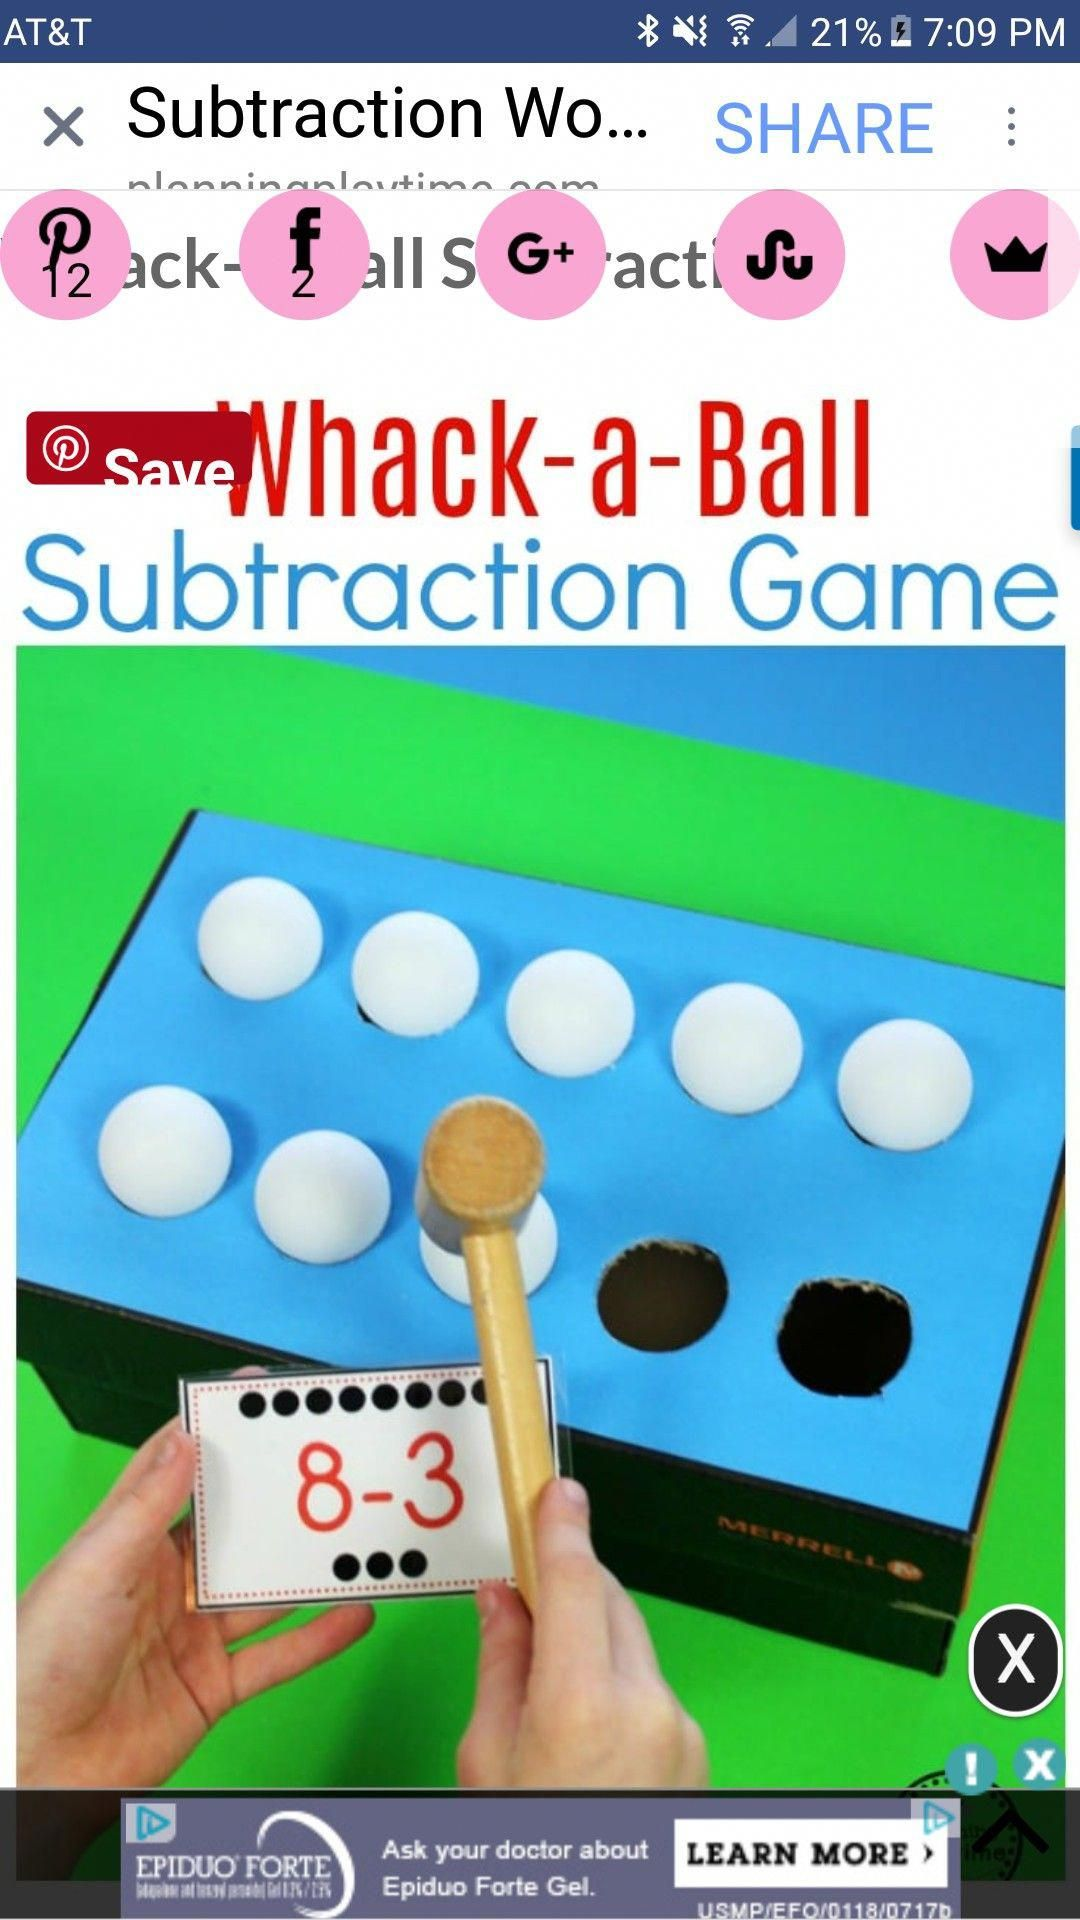 Onlinemathhelp Matematik Okul Oncesi Okul Addition and subtraction online games